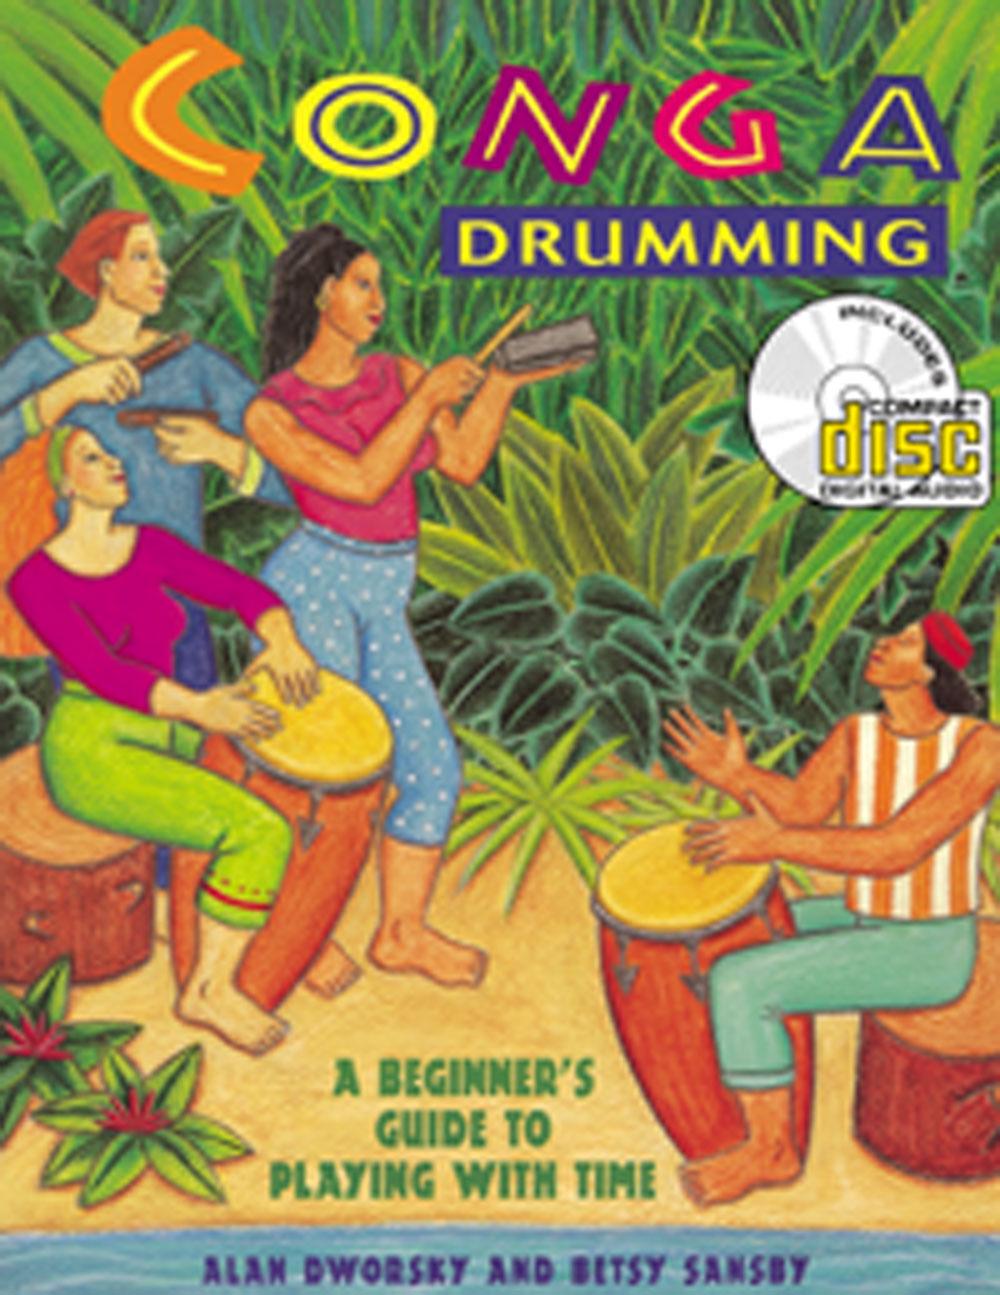 Conga Drumming (Book/CD)